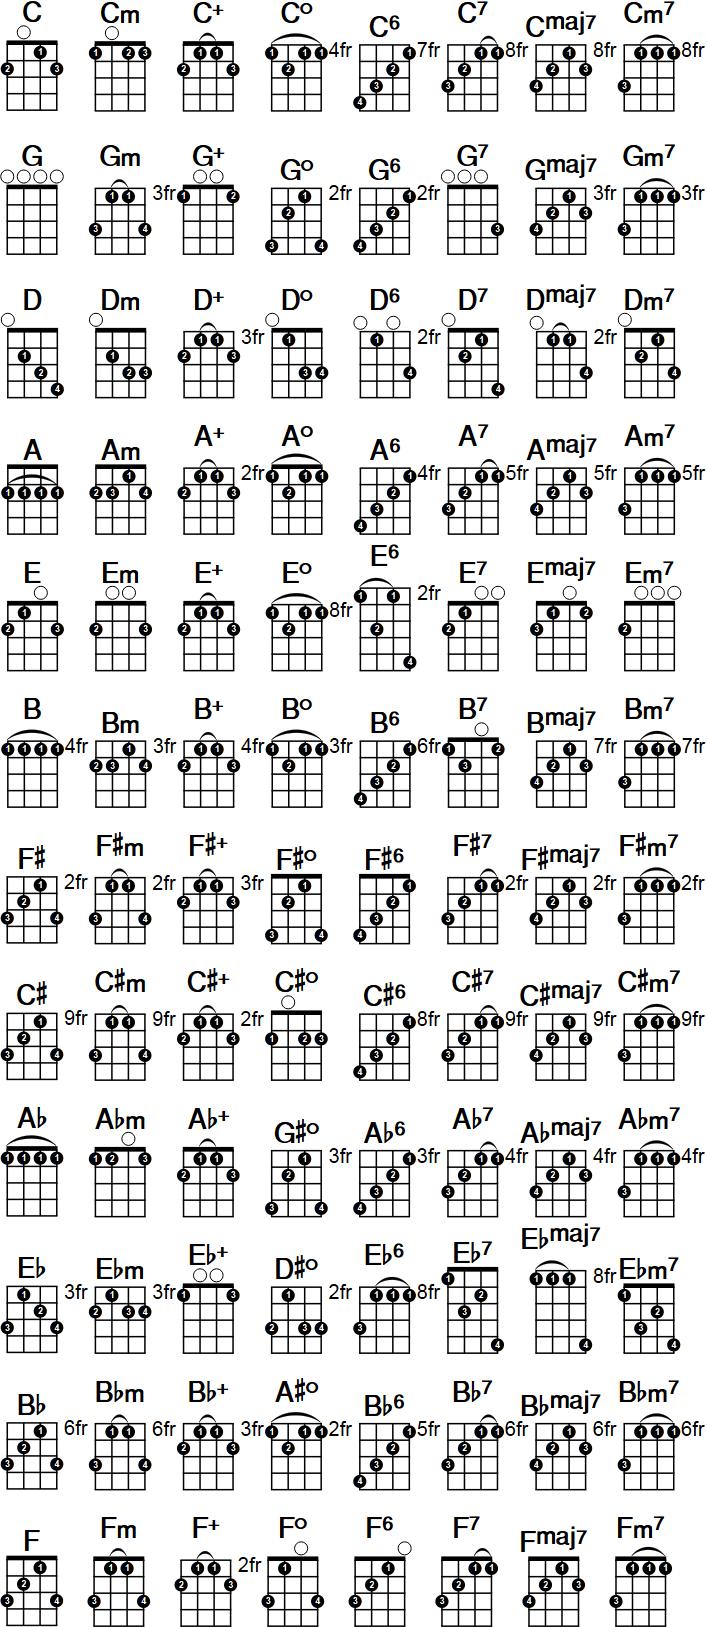 Tenor guitar chords cgda gallery guitar chords examples tenor guitar chords cgda gallery guitar chords examples banjo tenor banjo chords cgda tenor banjo chords hexwebz Image collections